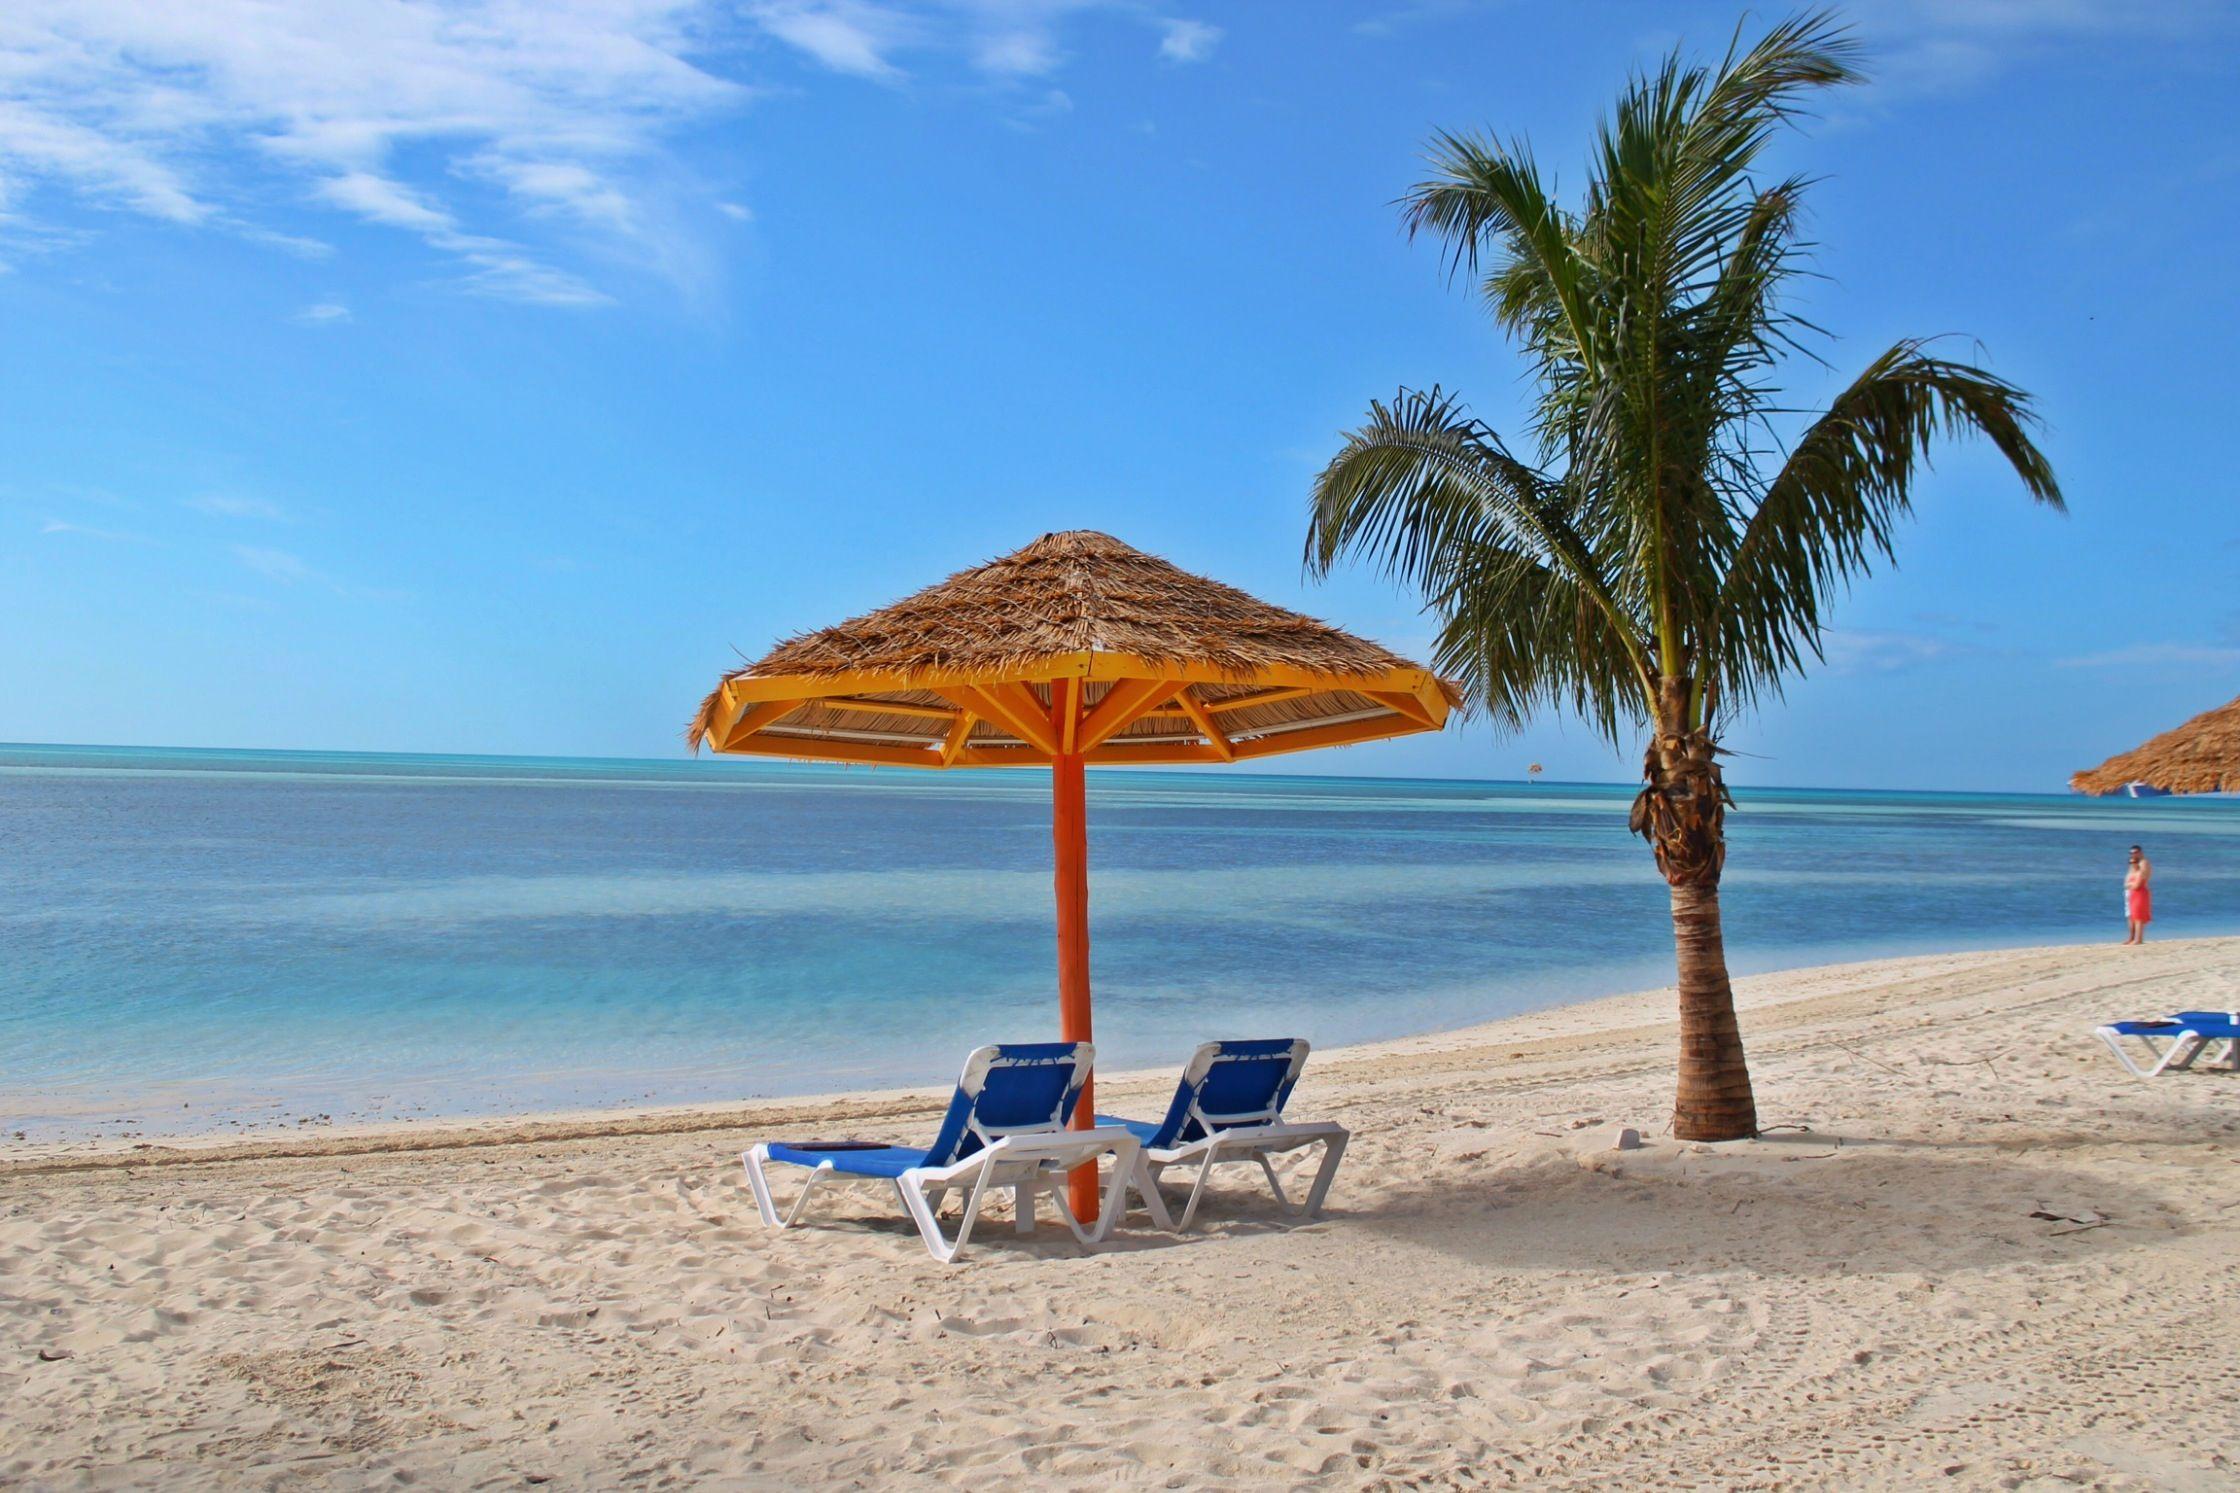 Cococay Bahamas Taken 2013  Estine39s Travels  Pinterest